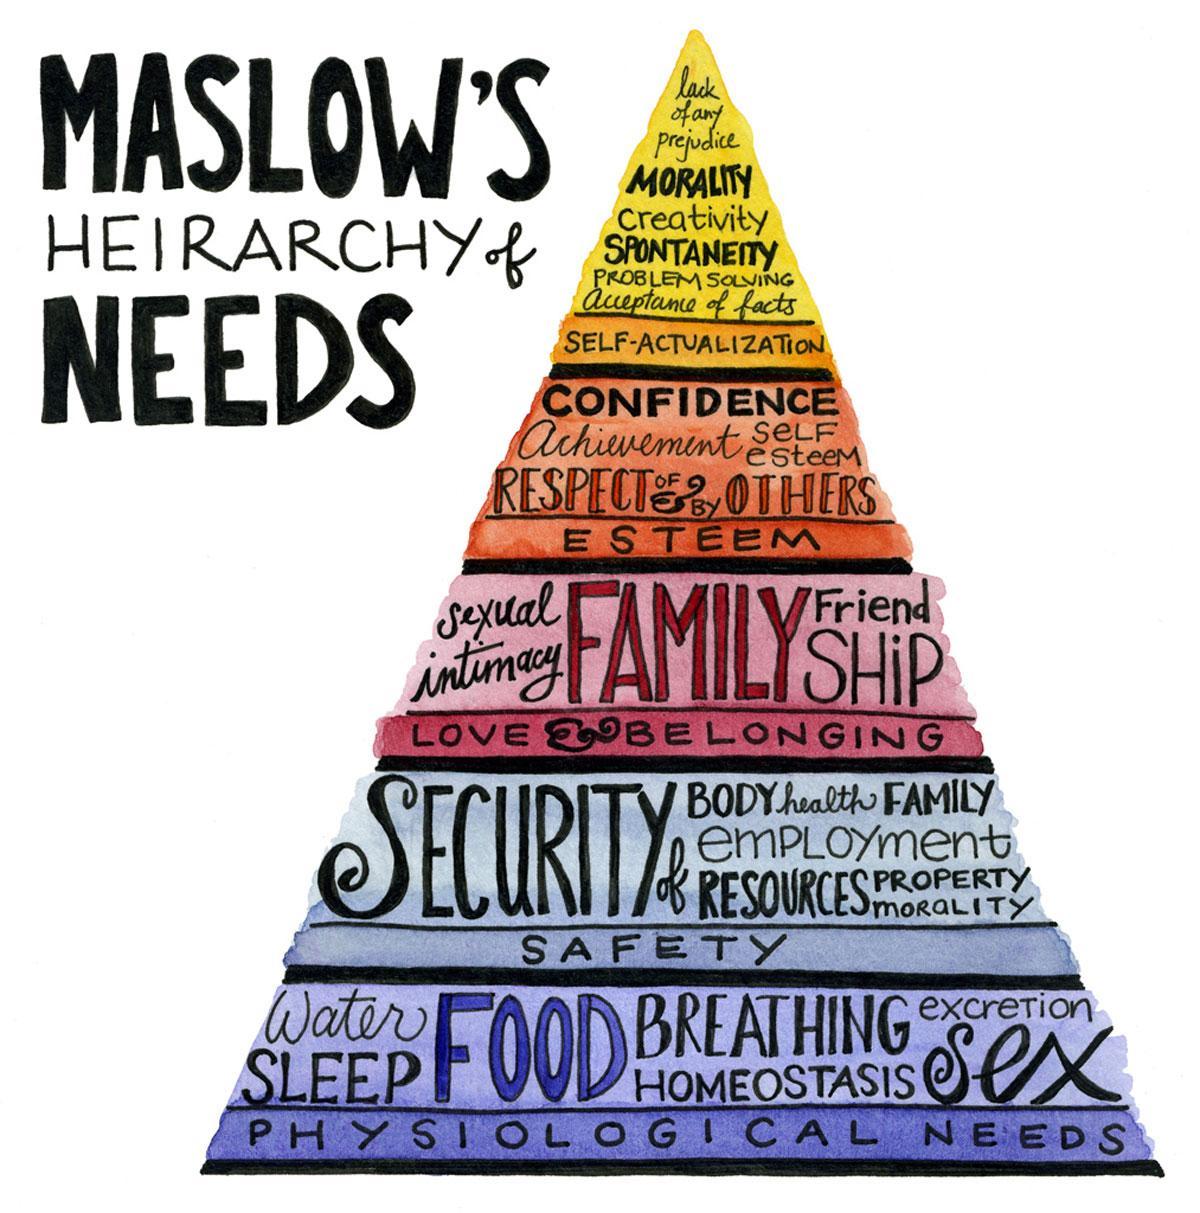 Imago_Maslow1_feature